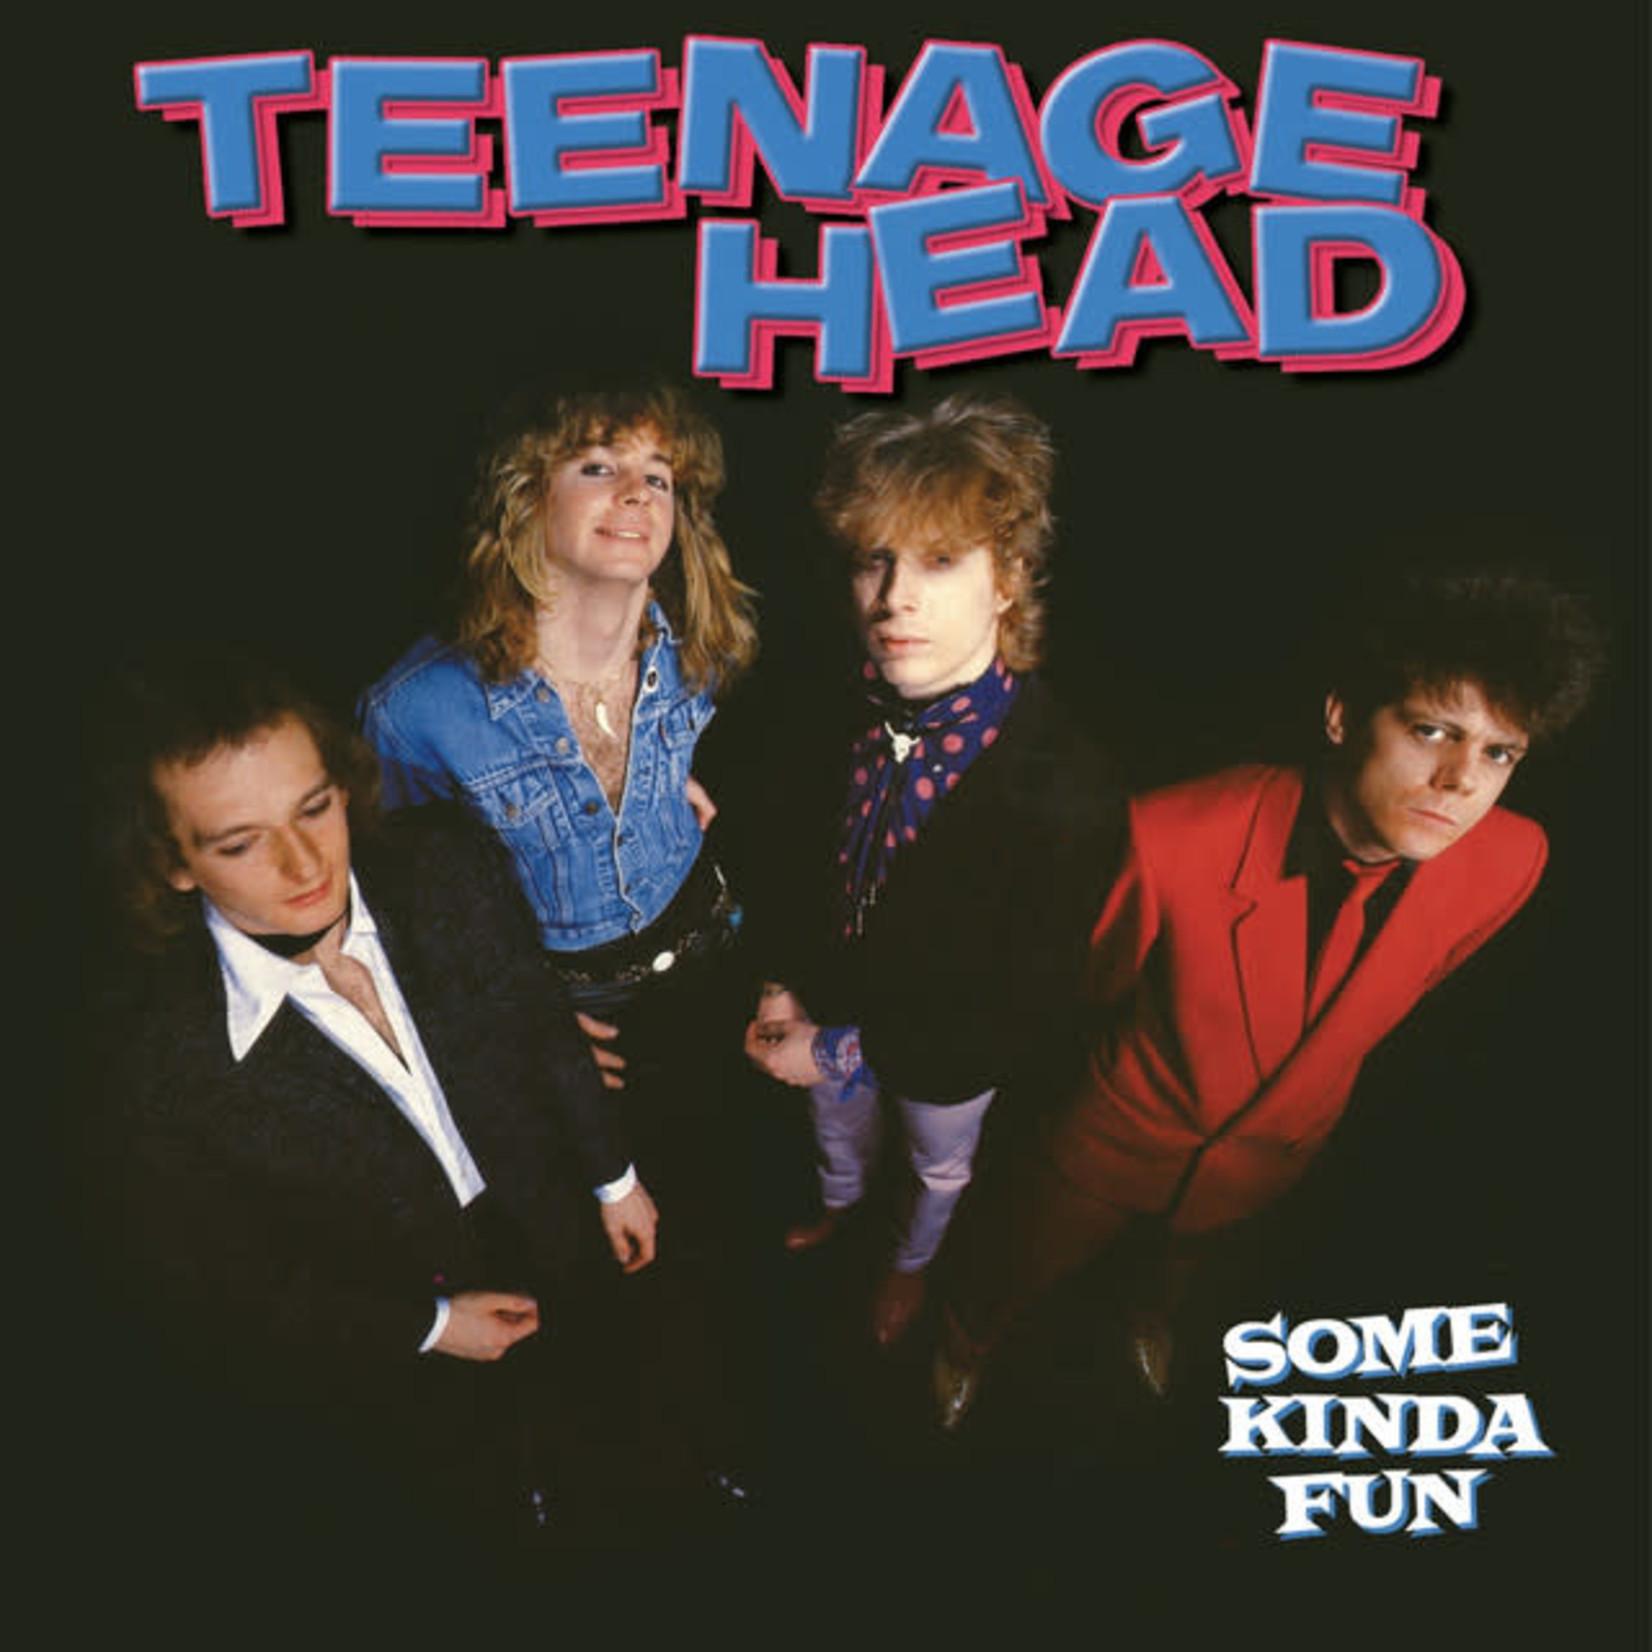 Vinyl Teenage Head - Some Kinda Fun